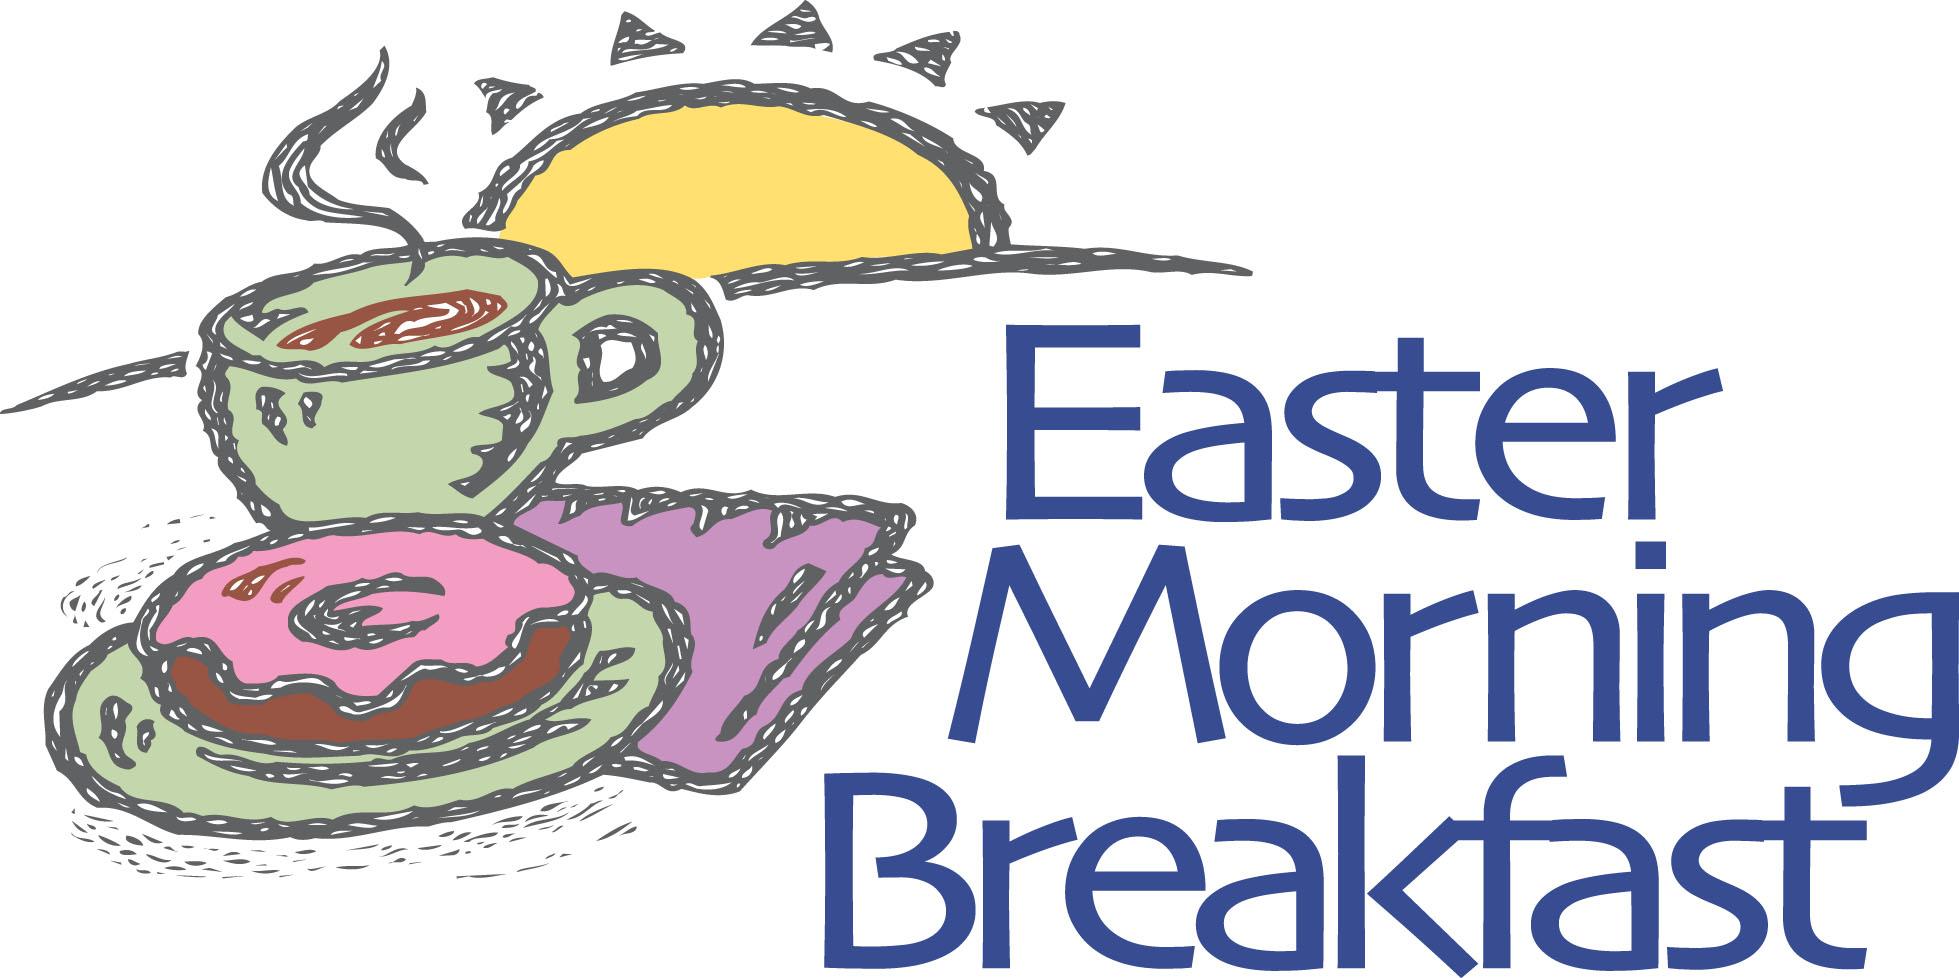 hight resolution of church breakfast clipart